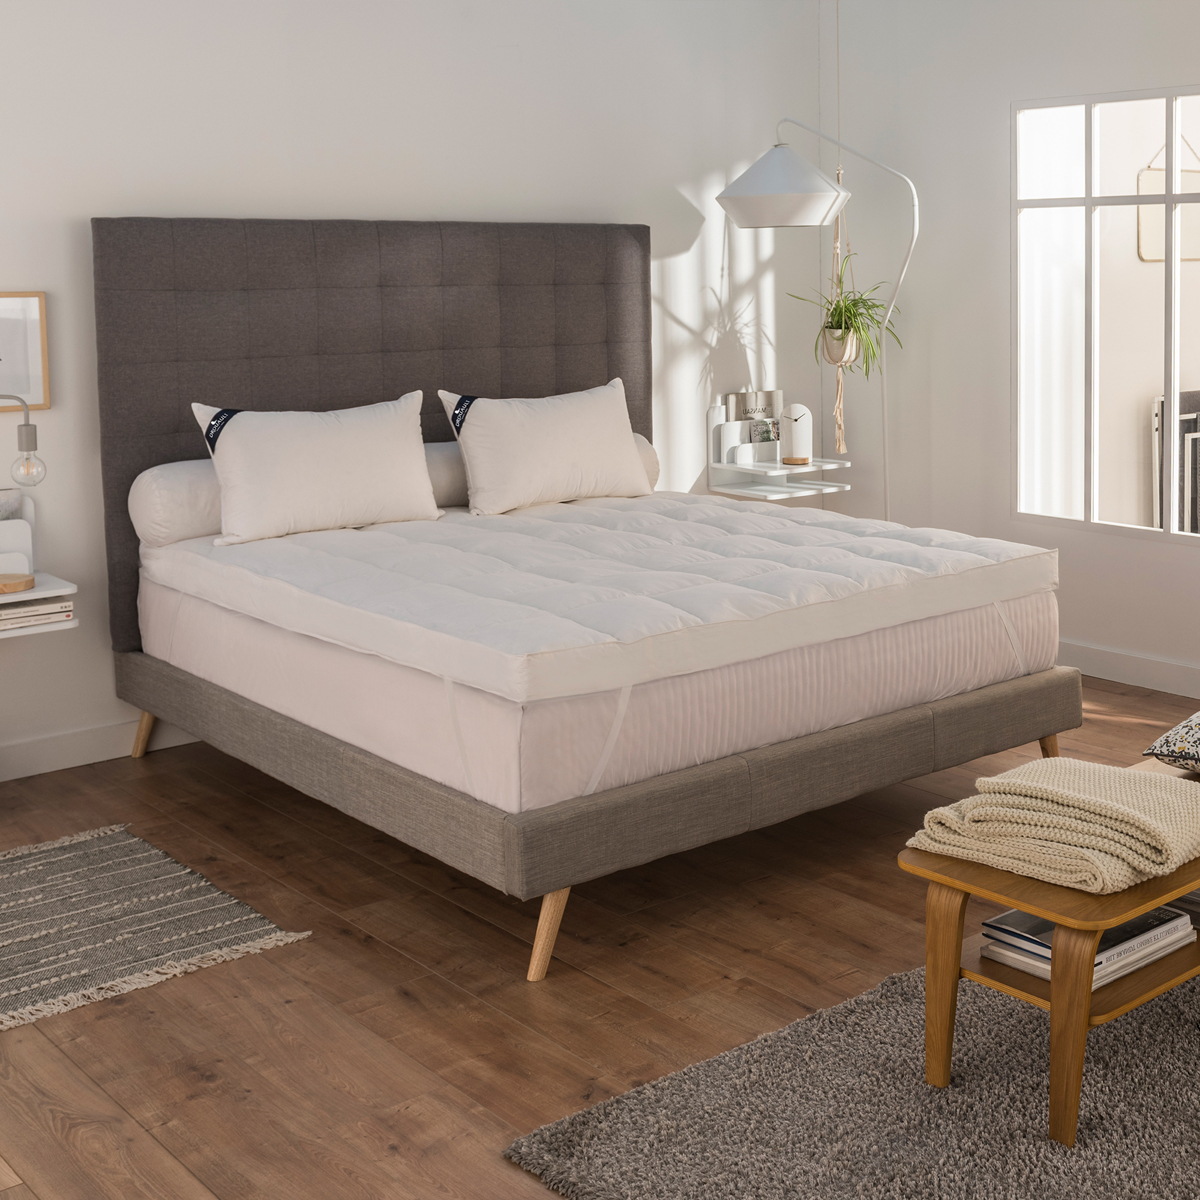 Surconfort de Matelas Haut Luxe Pro 200x200 cm